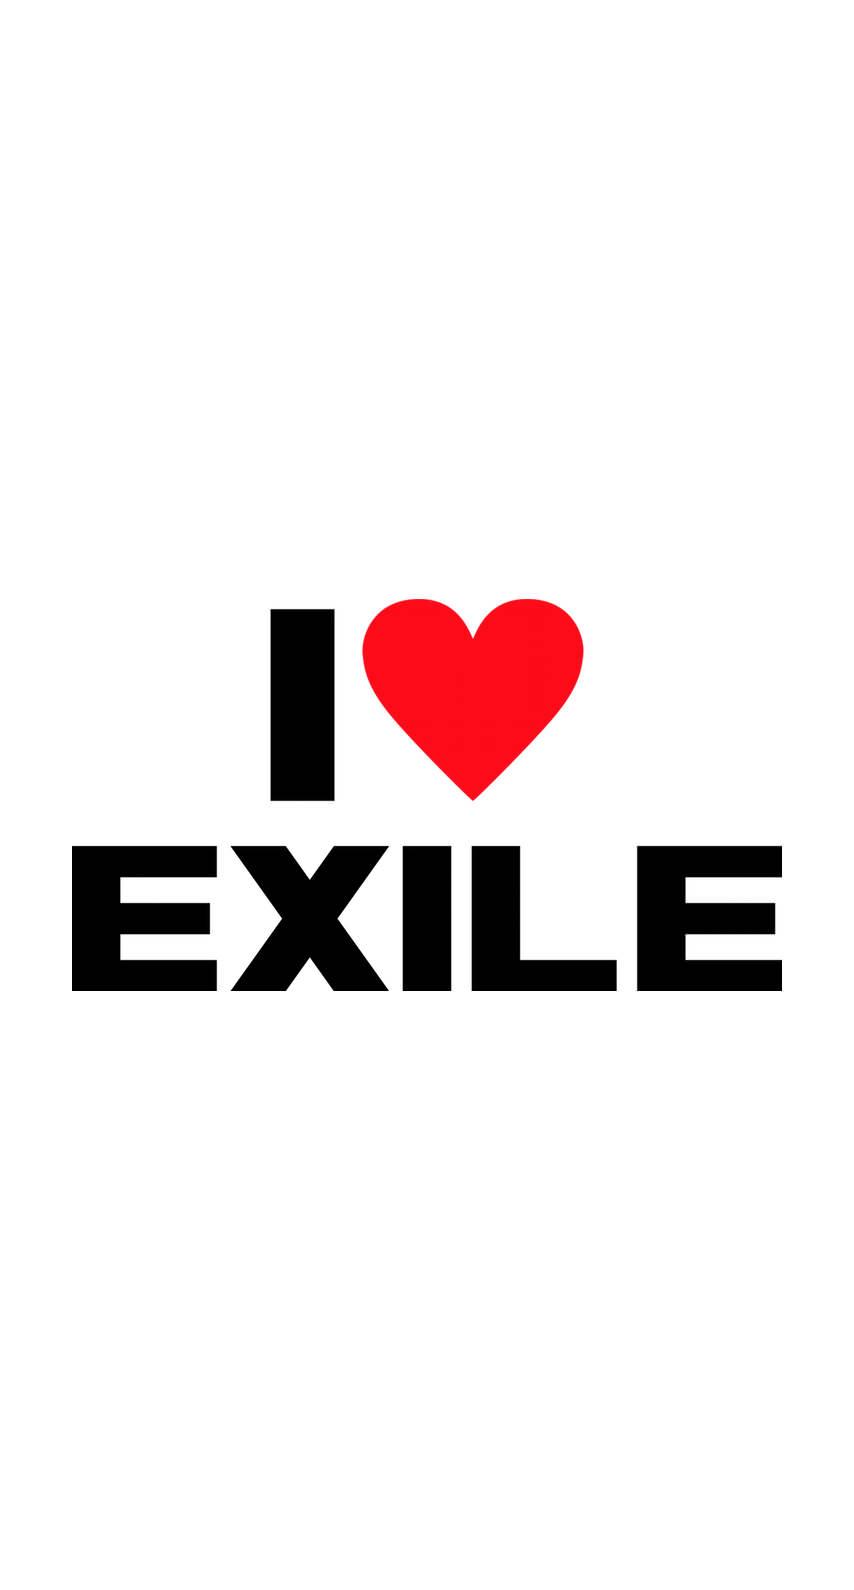 EXILEファンにおすすめ!!I Love EXILE